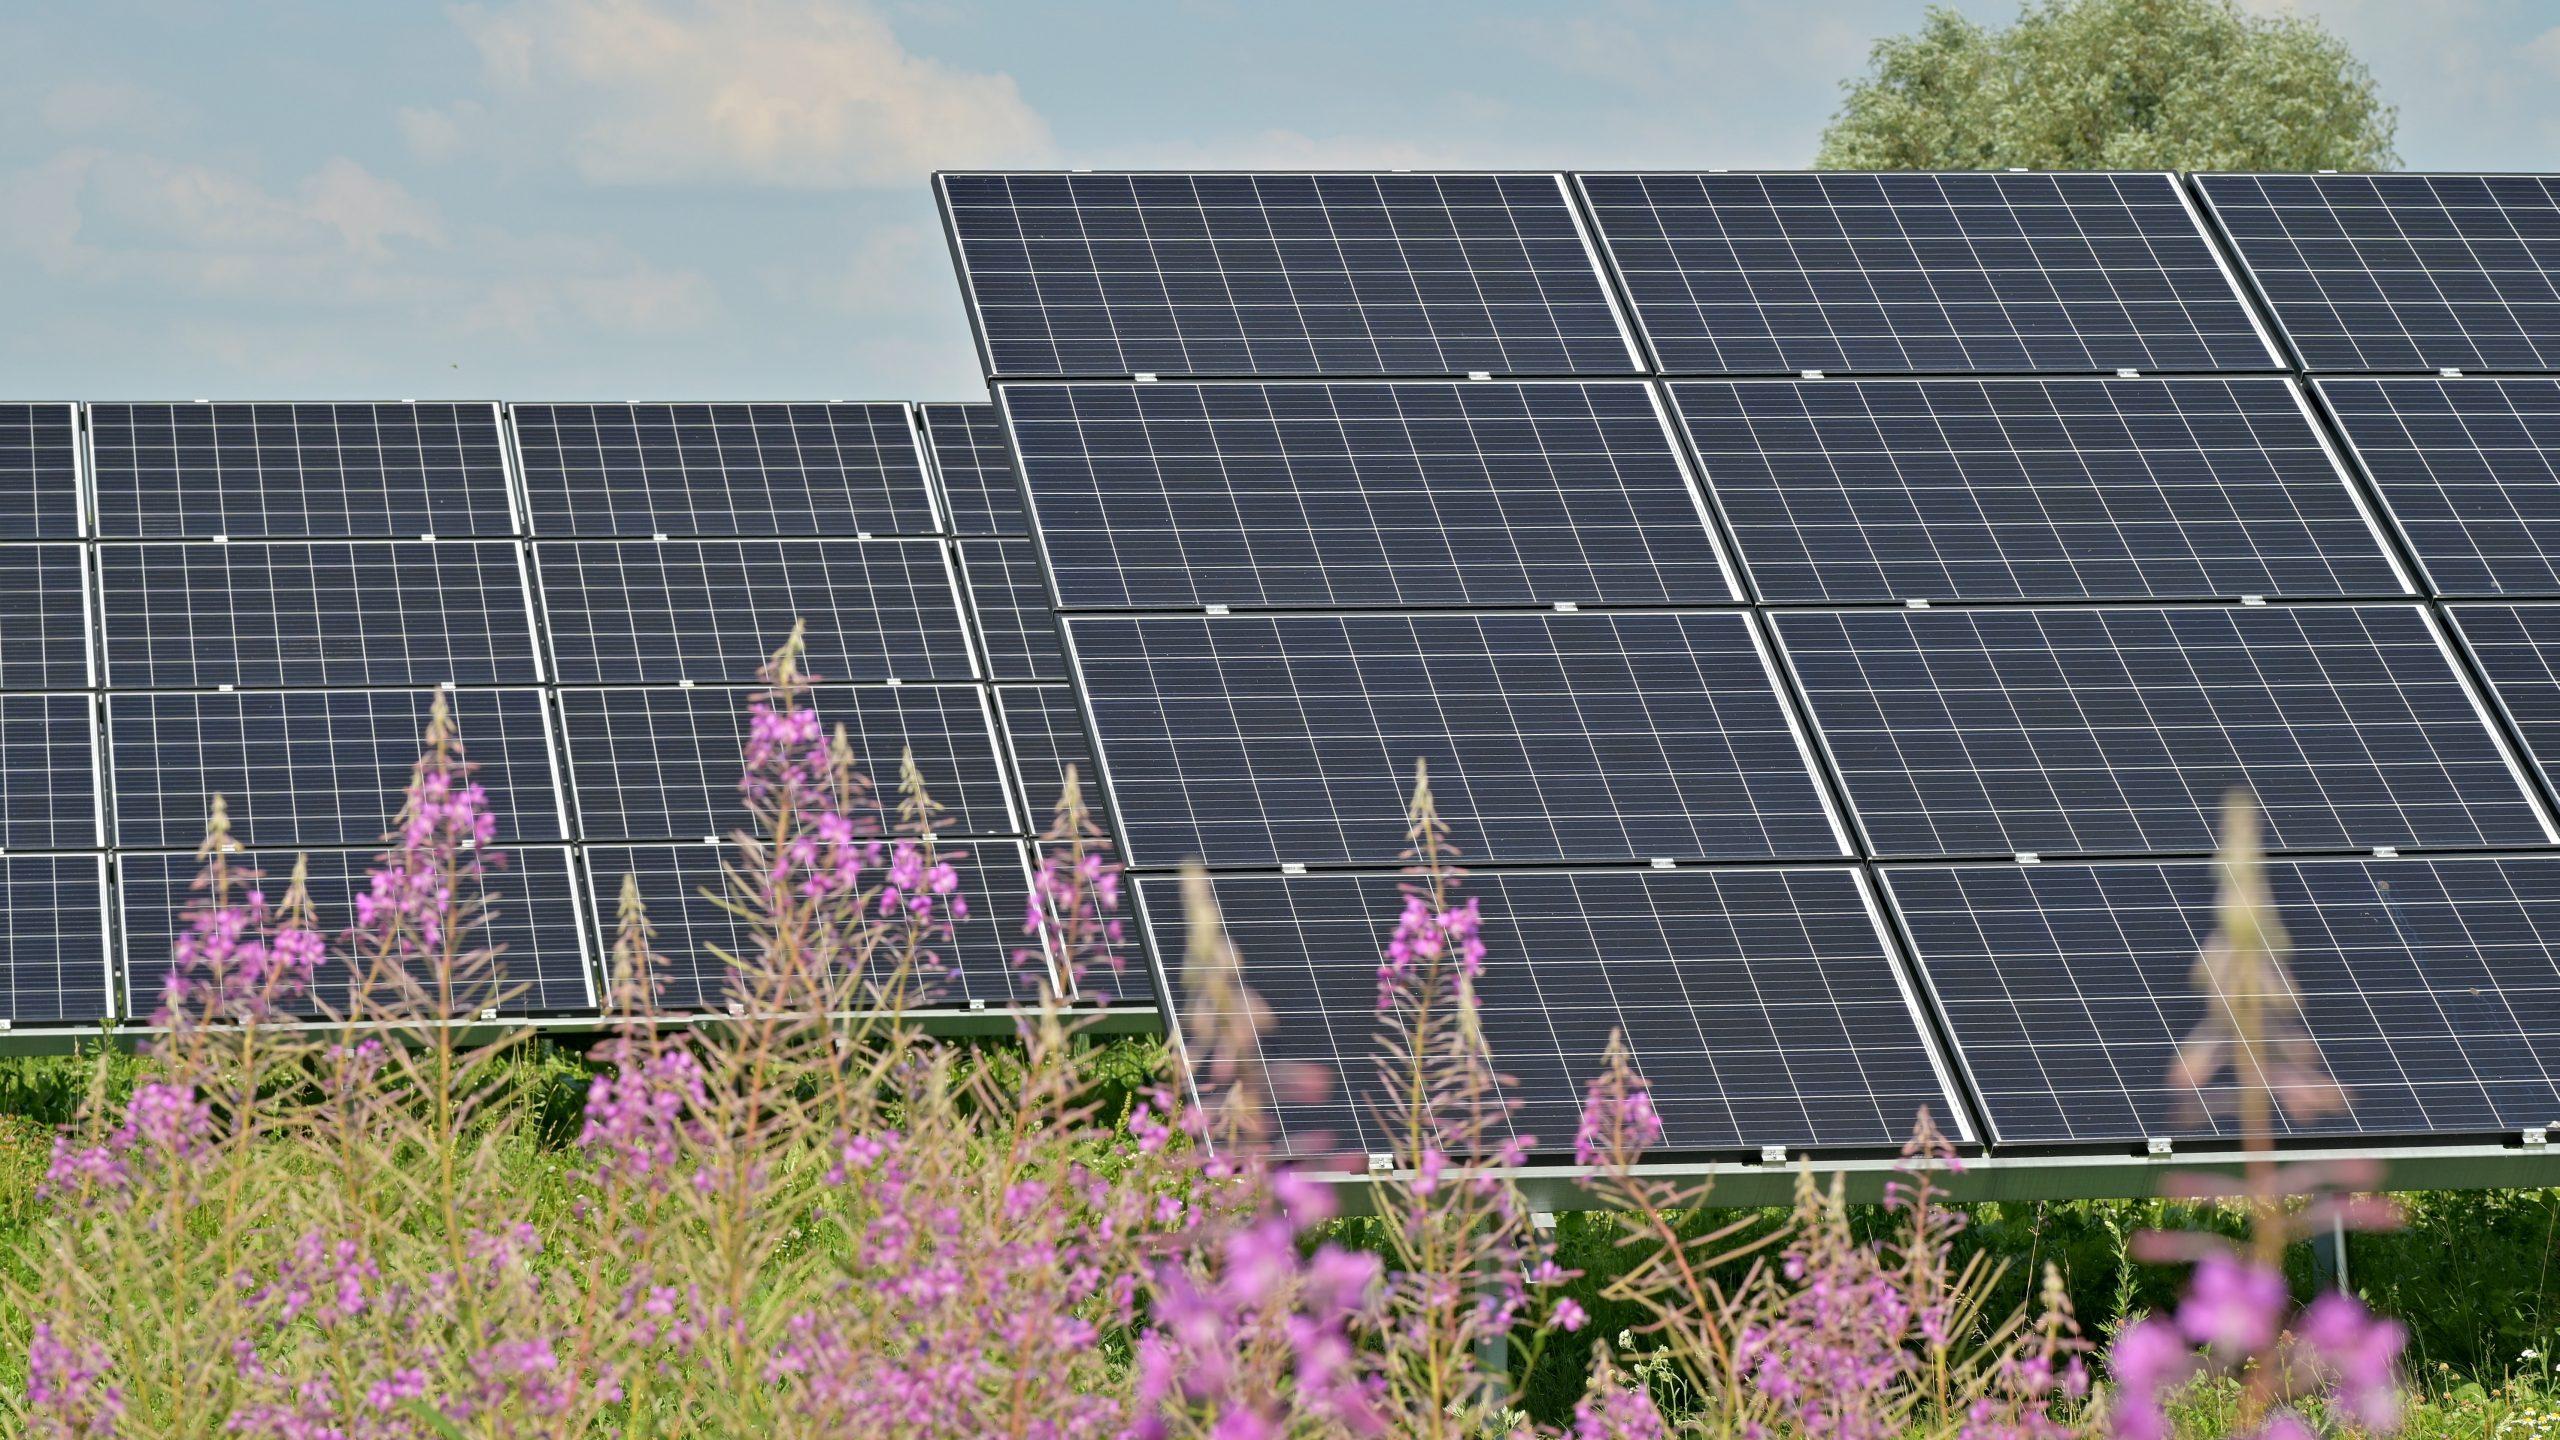 solar panels in a field of wildflowers